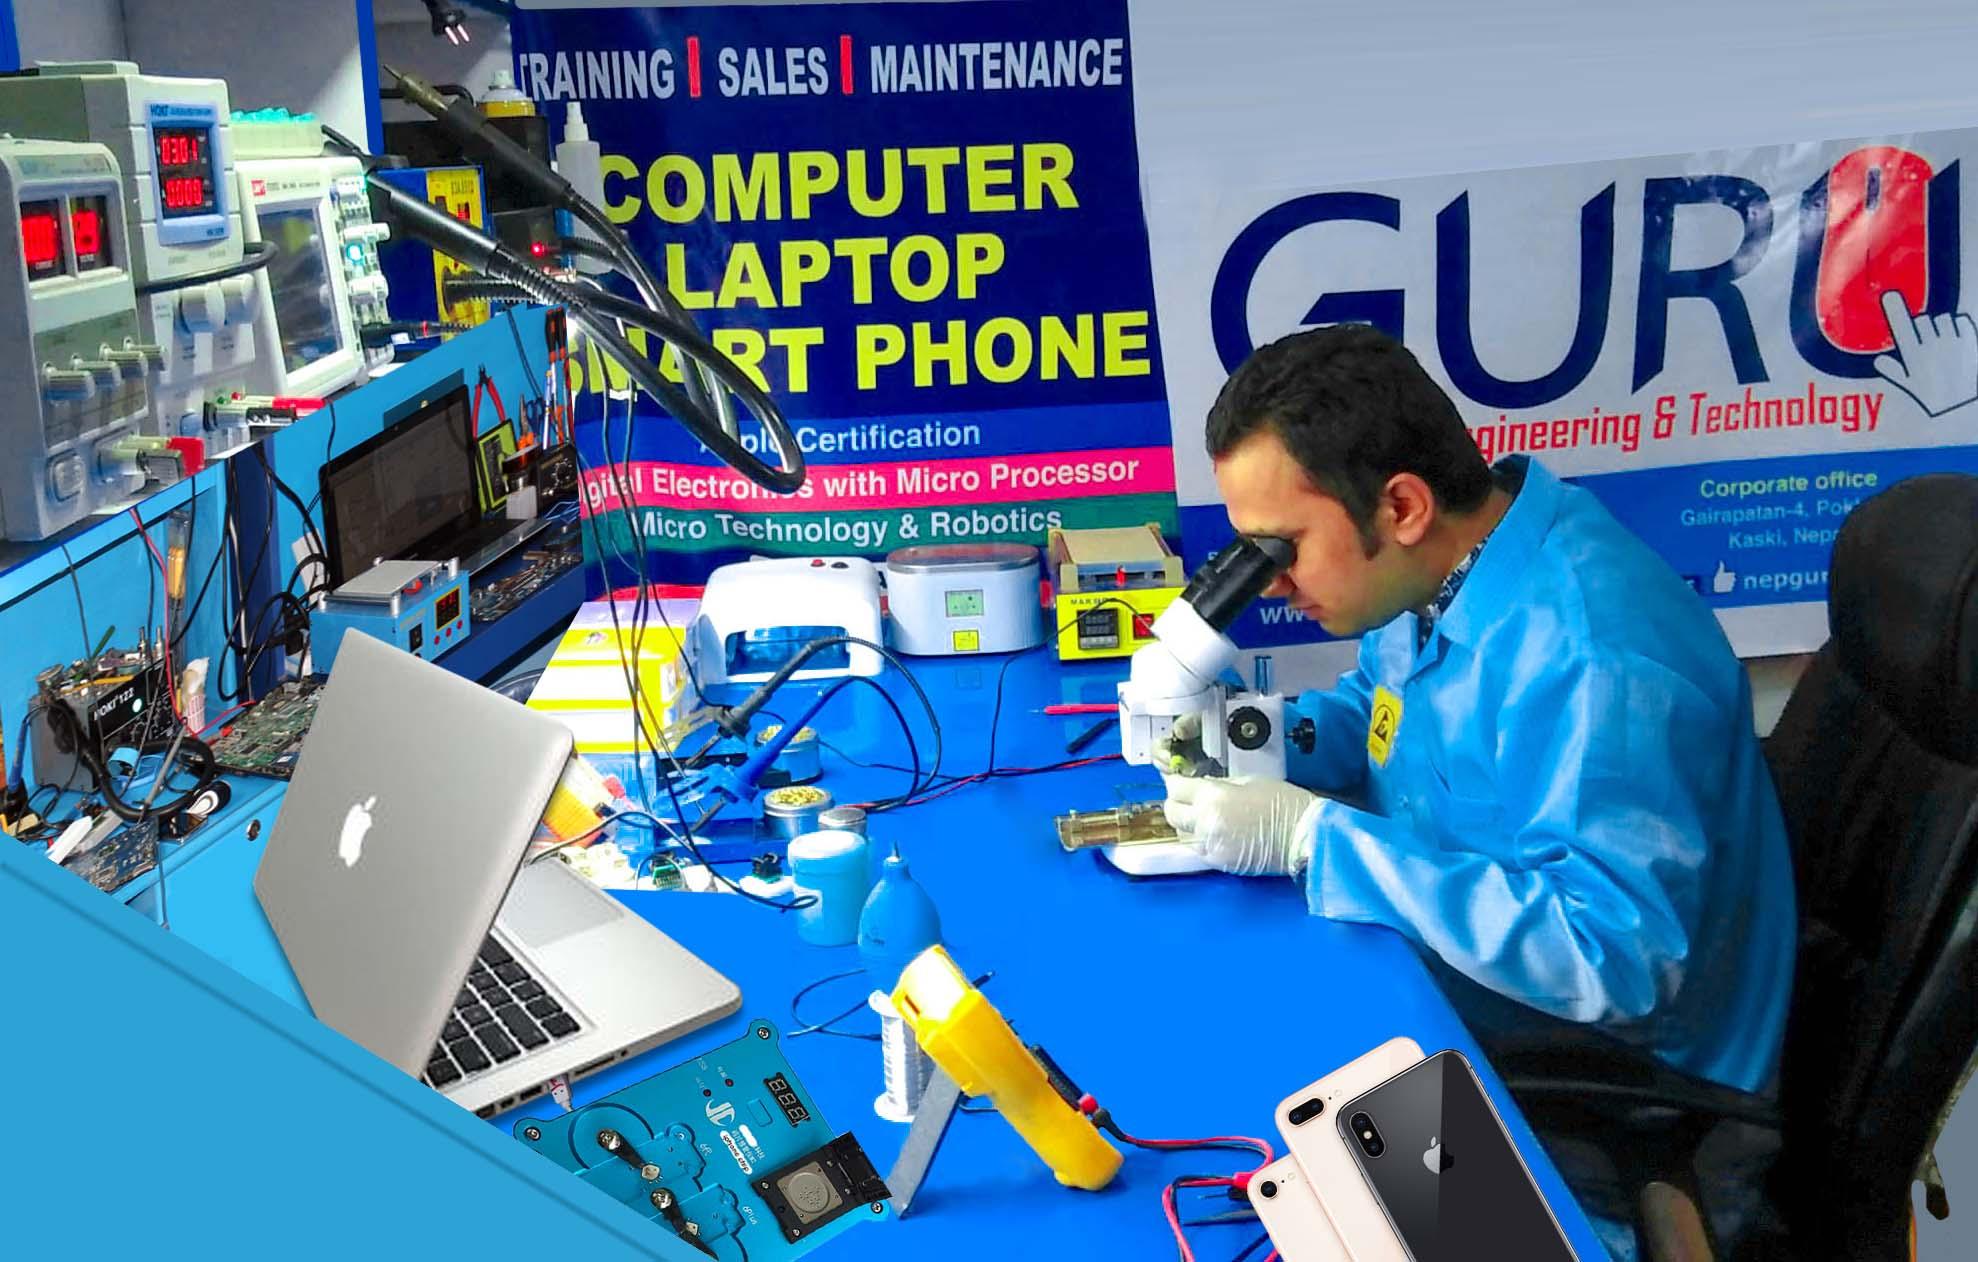 Laptop Repair Services kathmandu Nepal